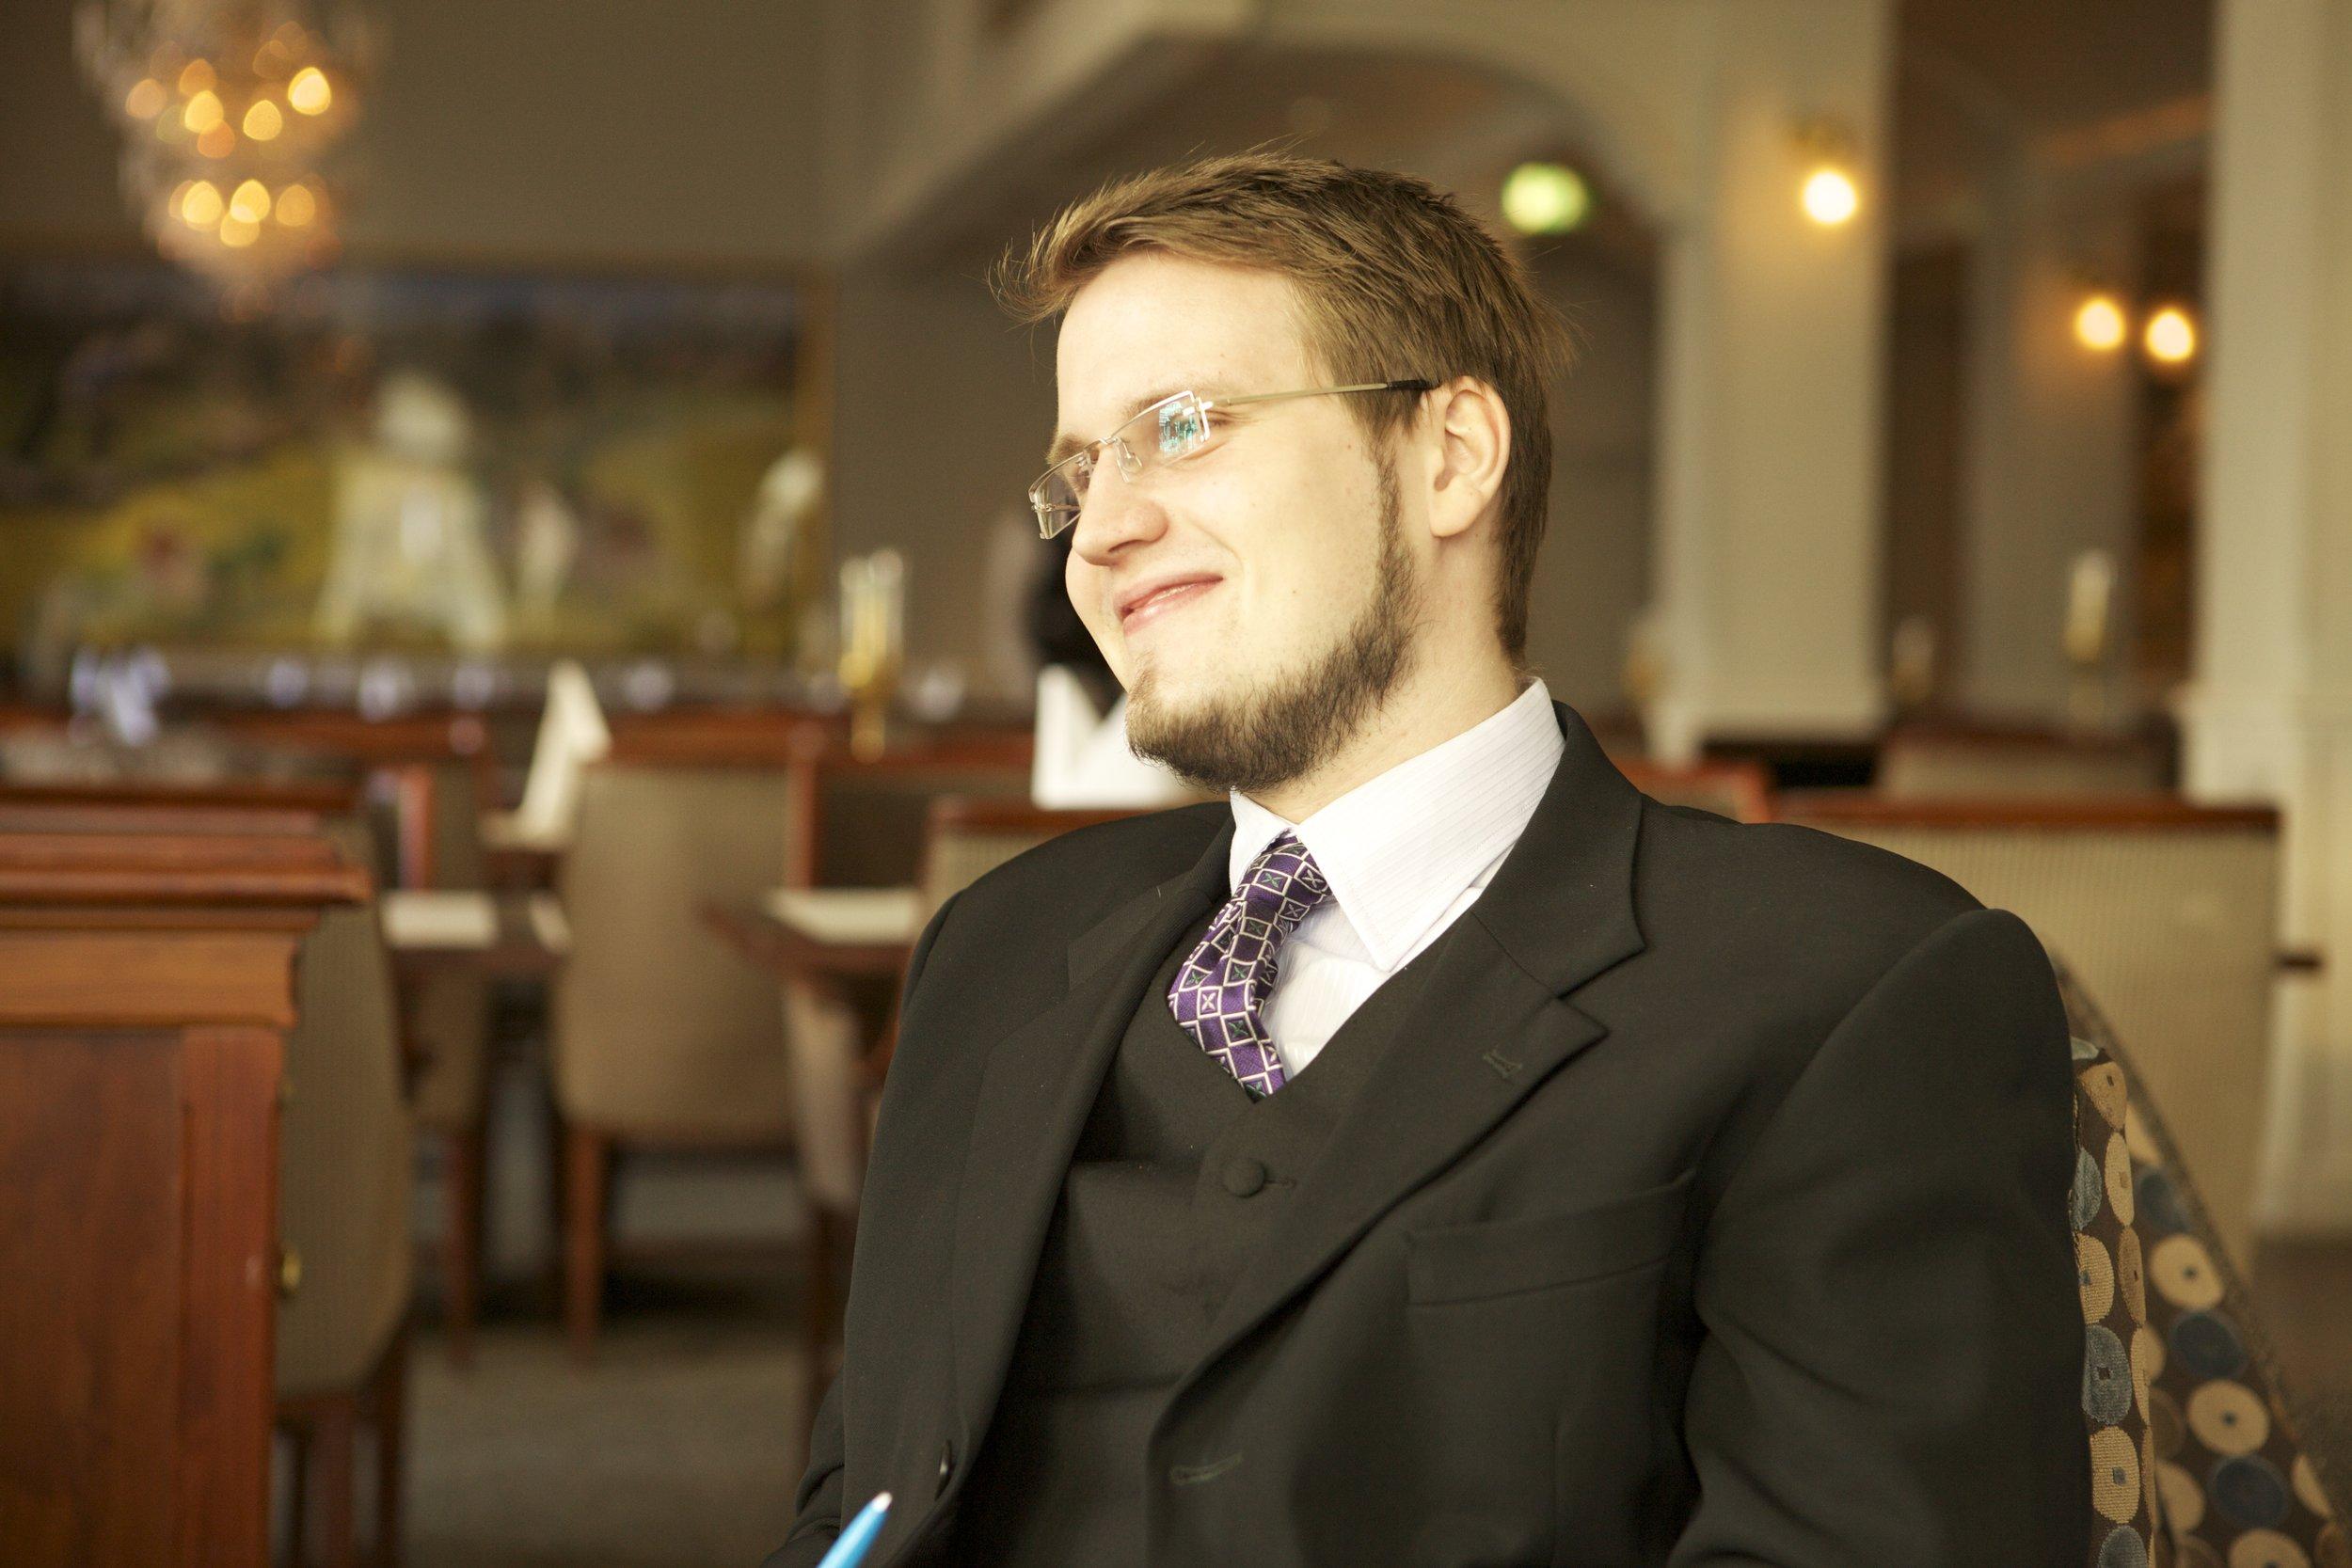 Ferencz Thuroczy Expert on Digital Communication Social Media Attila Communications and advisory